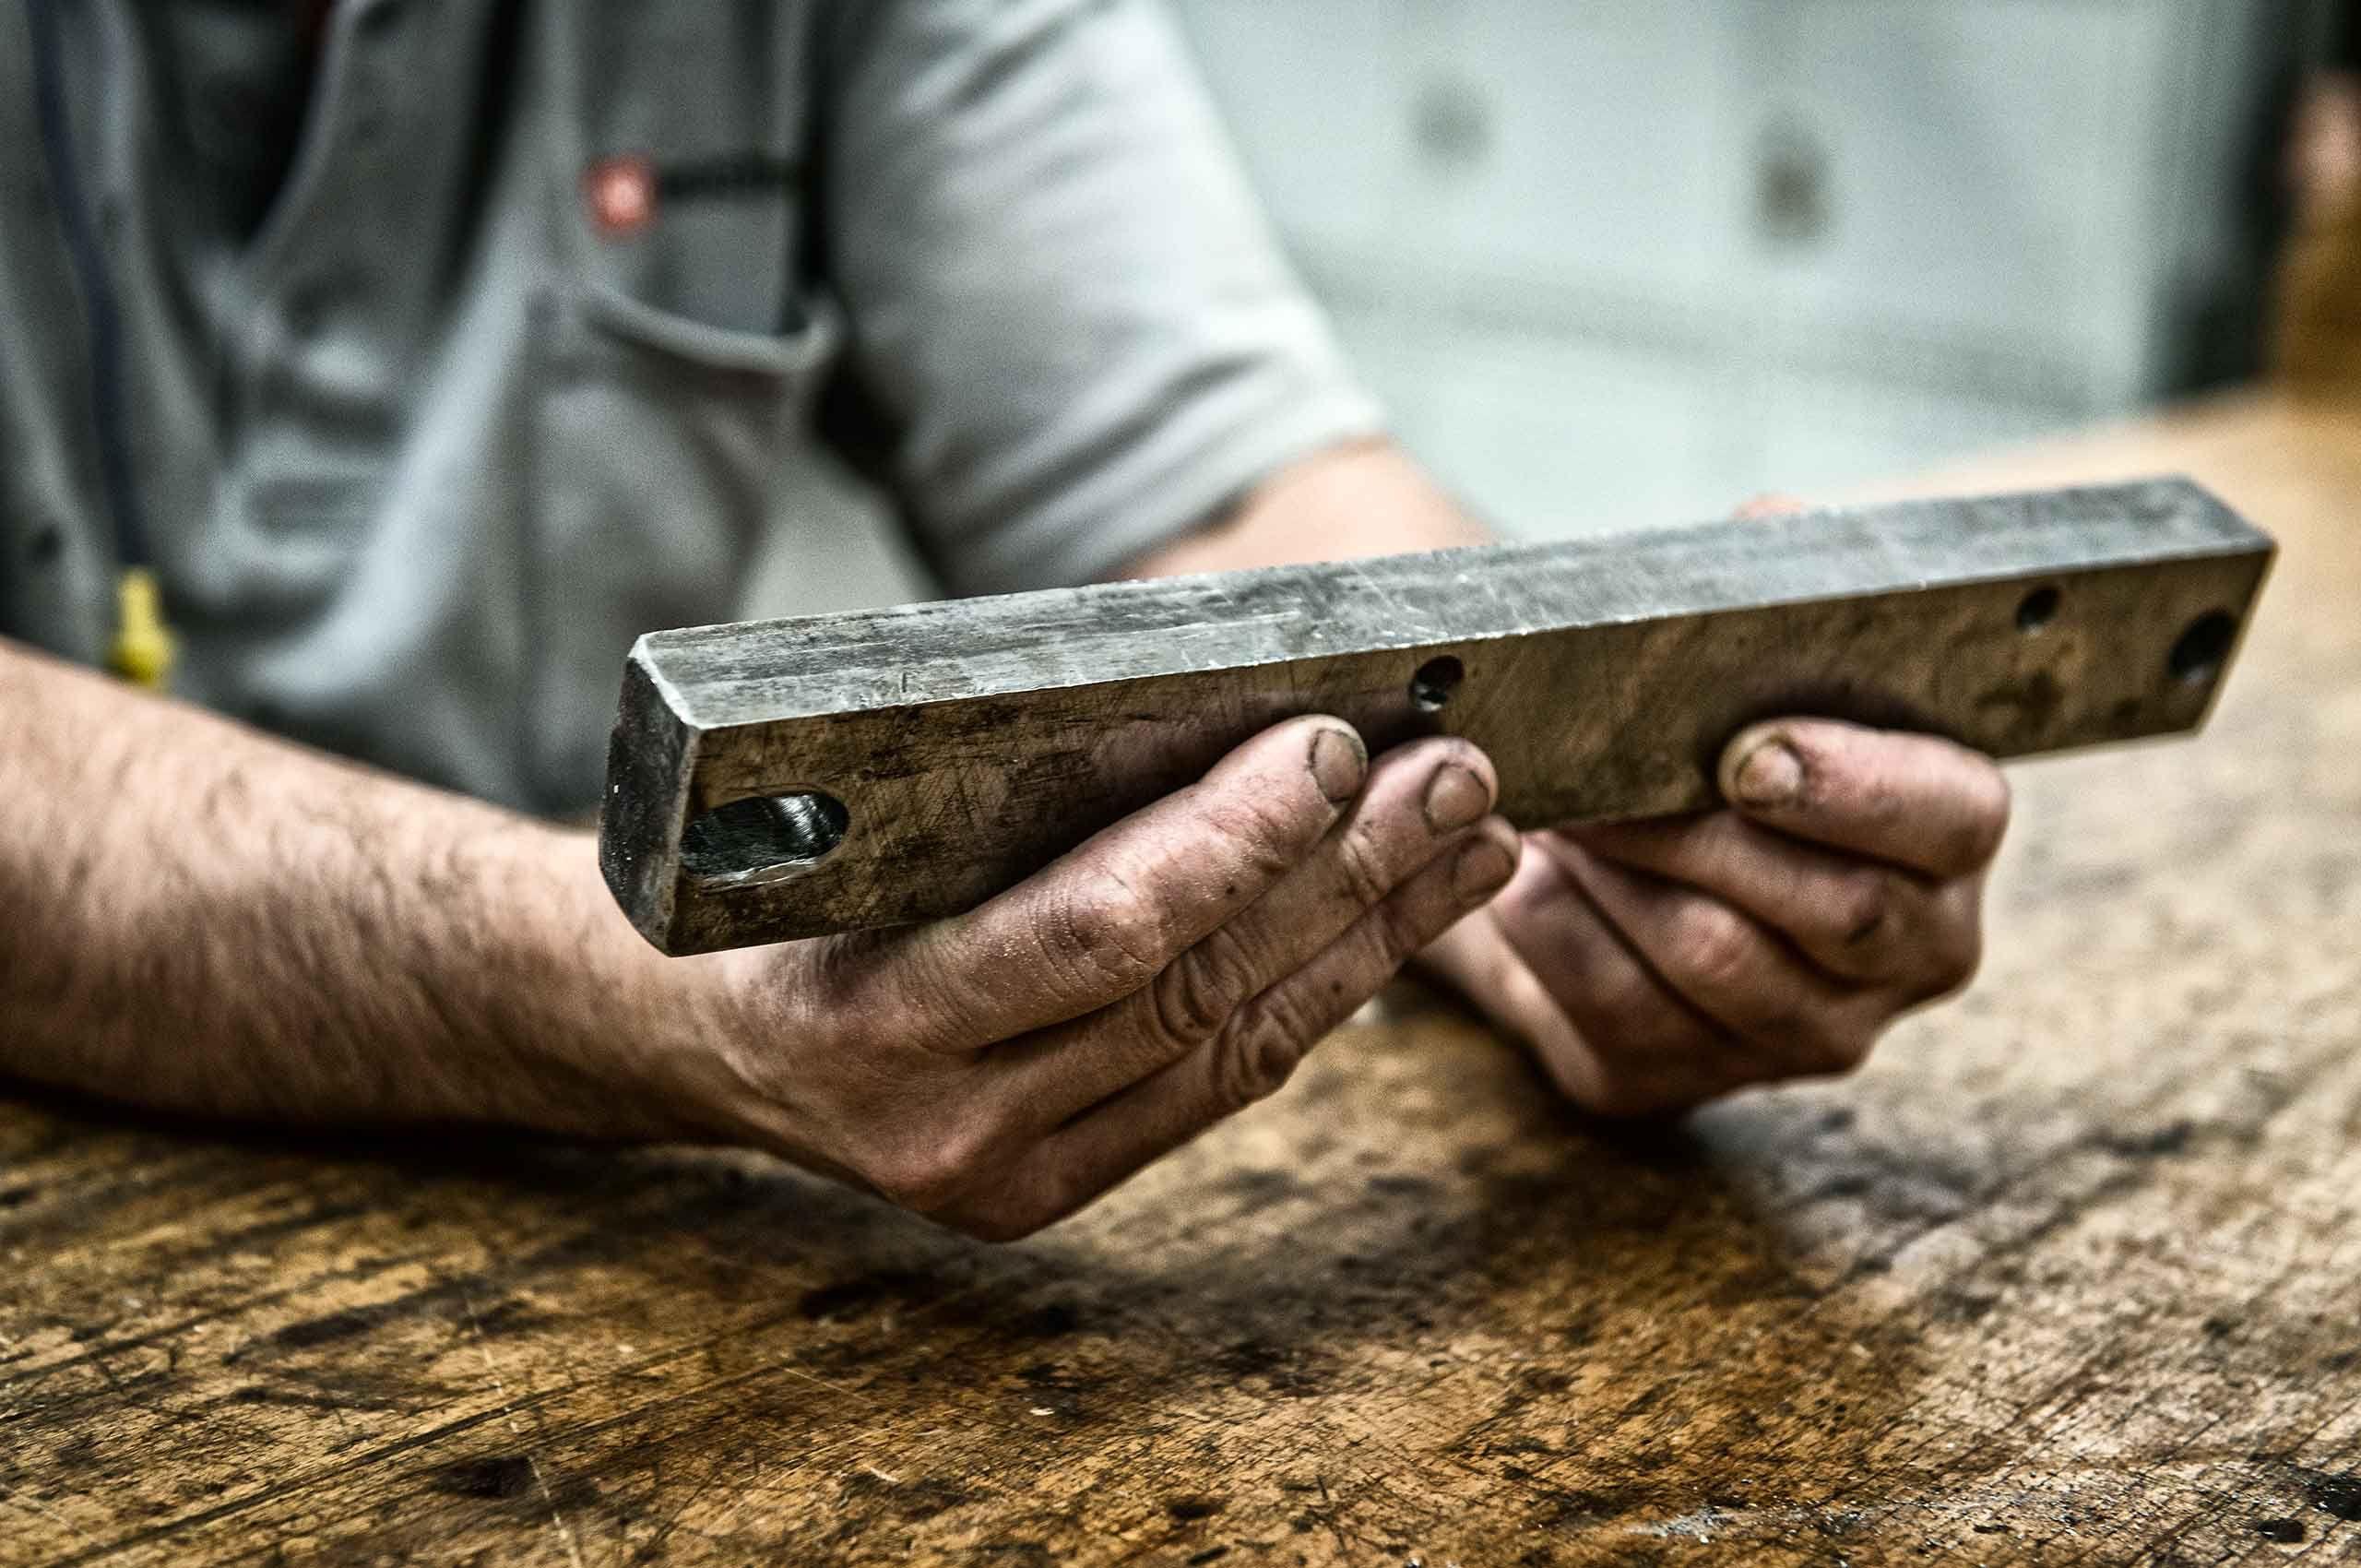 tool-inspection-wustof-factory-solingen-germany-by-HenrikOlundPhotography.jpg